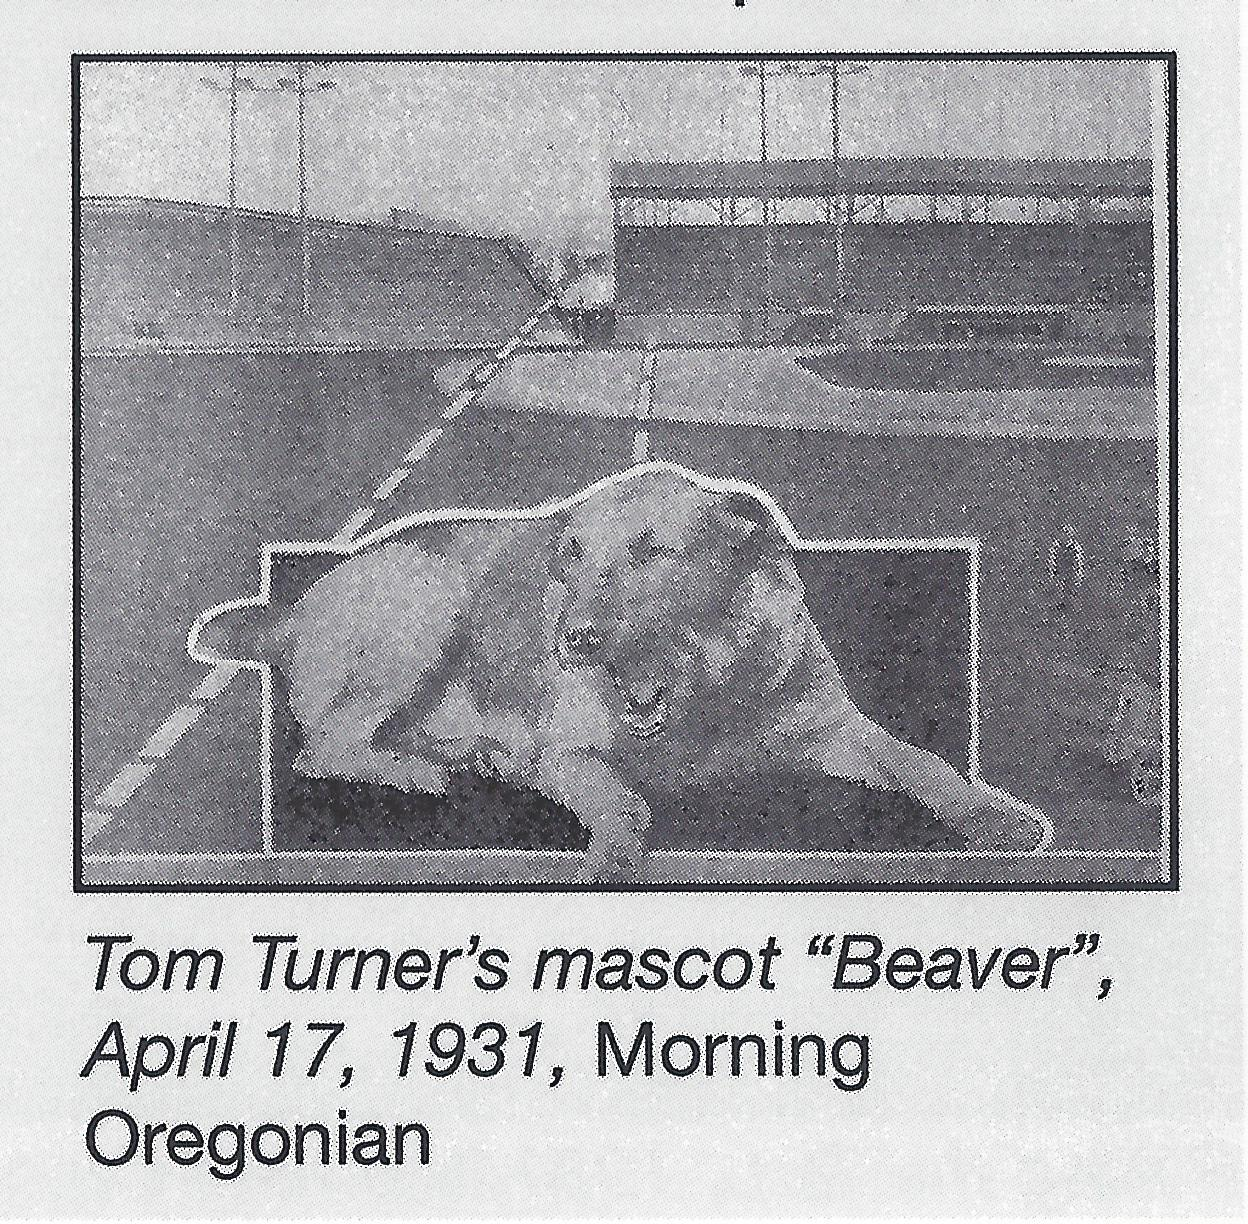 beaver-the-mascot